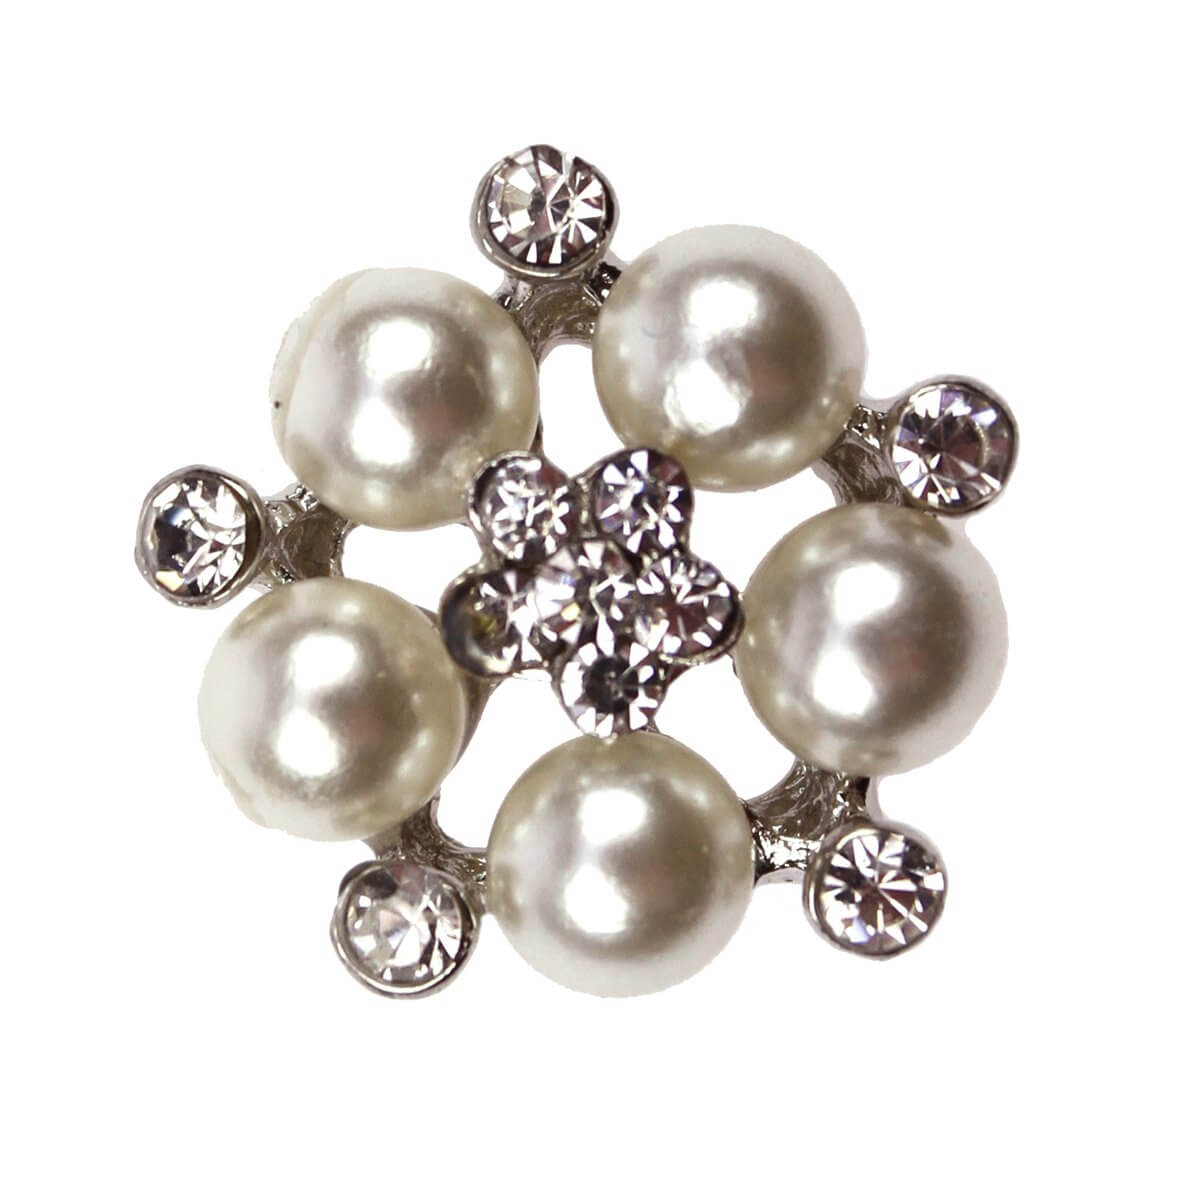 Pelegrina Central Diamante and Pearl Embellishment